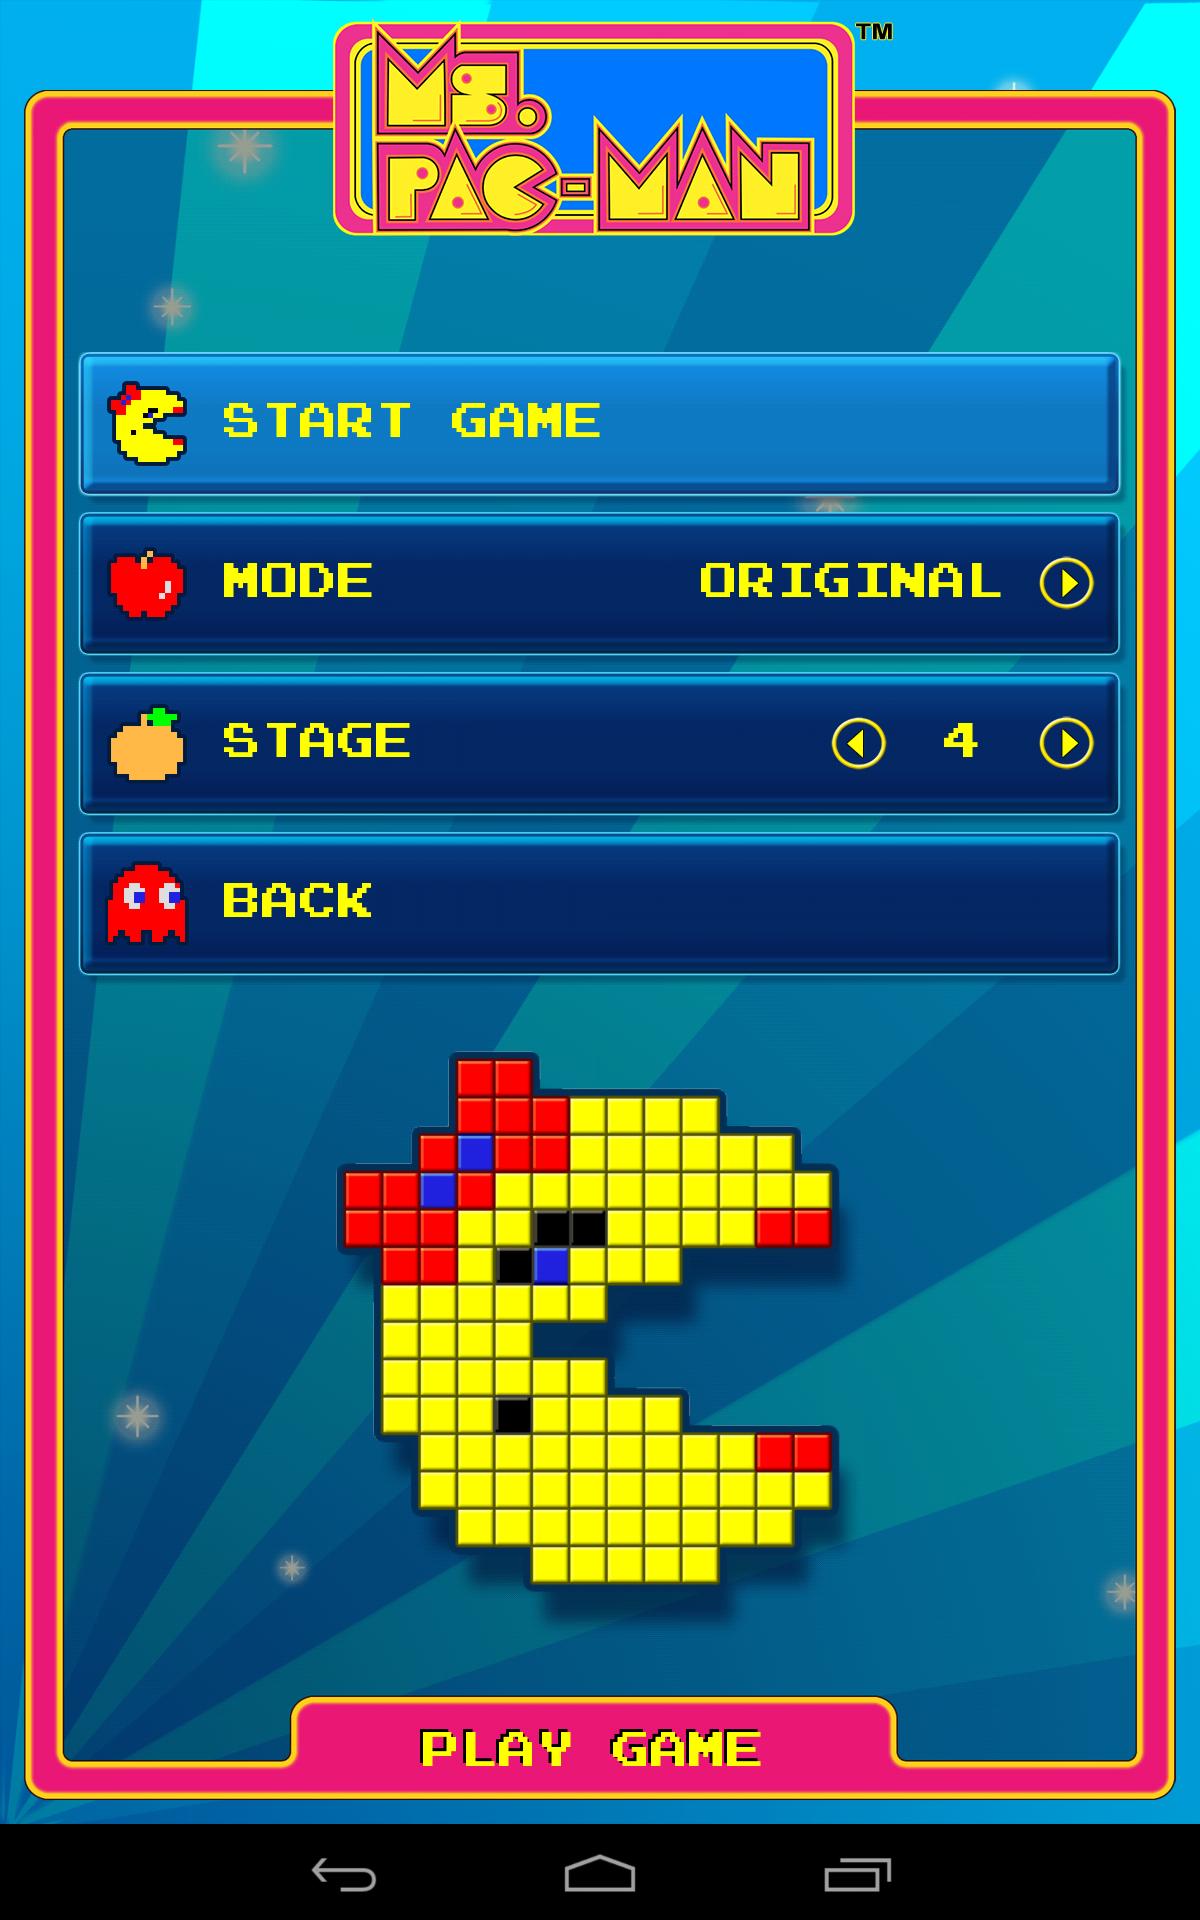 Ms. PAC-MAN by Namco screenshot #2